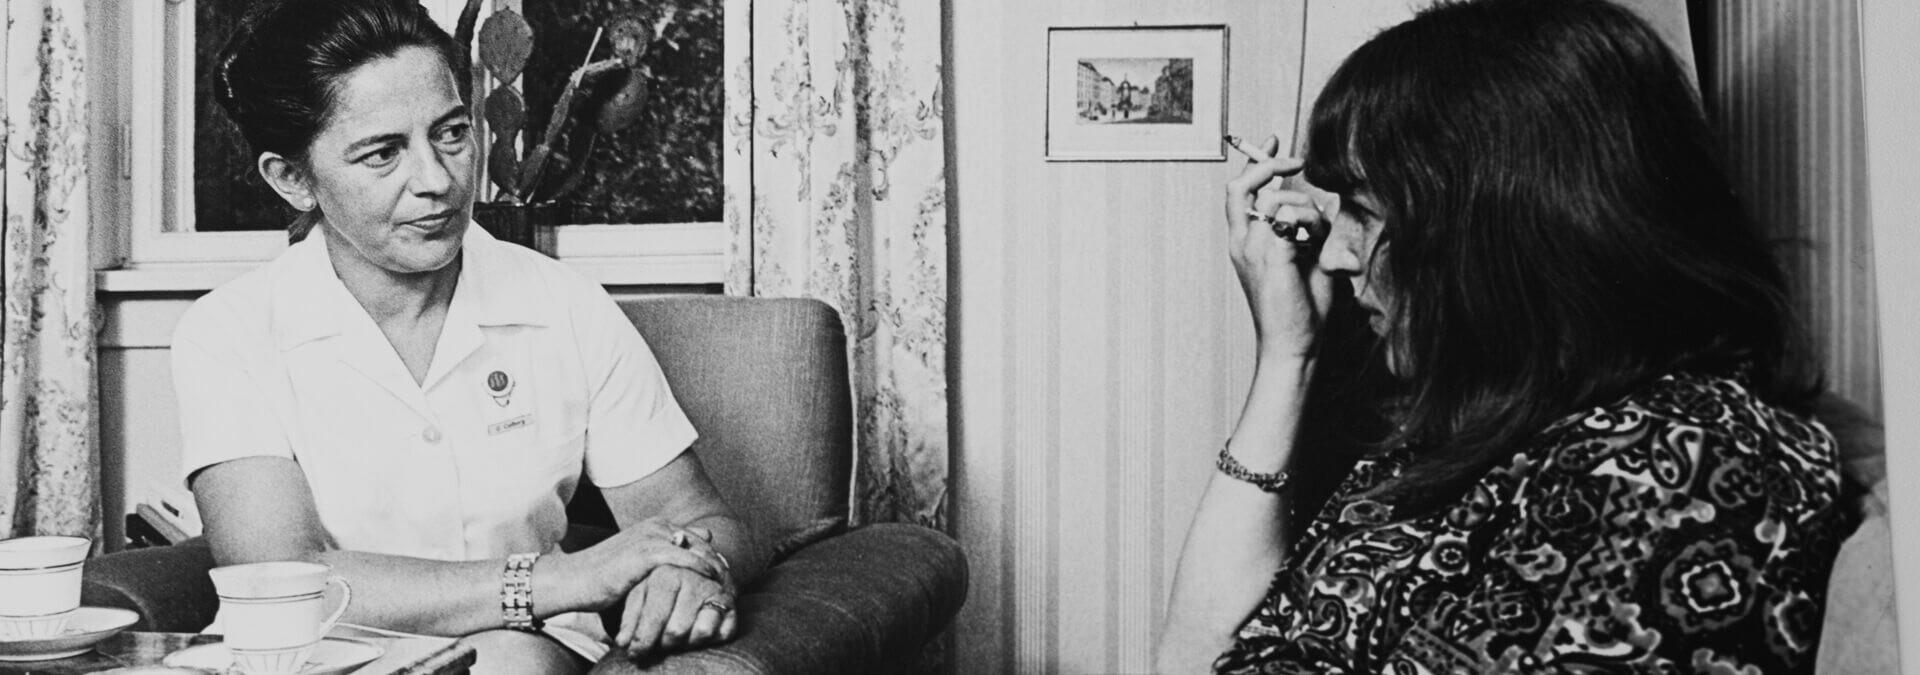 Forstander Gerda Colbert taler med en beboer, Kvindehjemmets historie